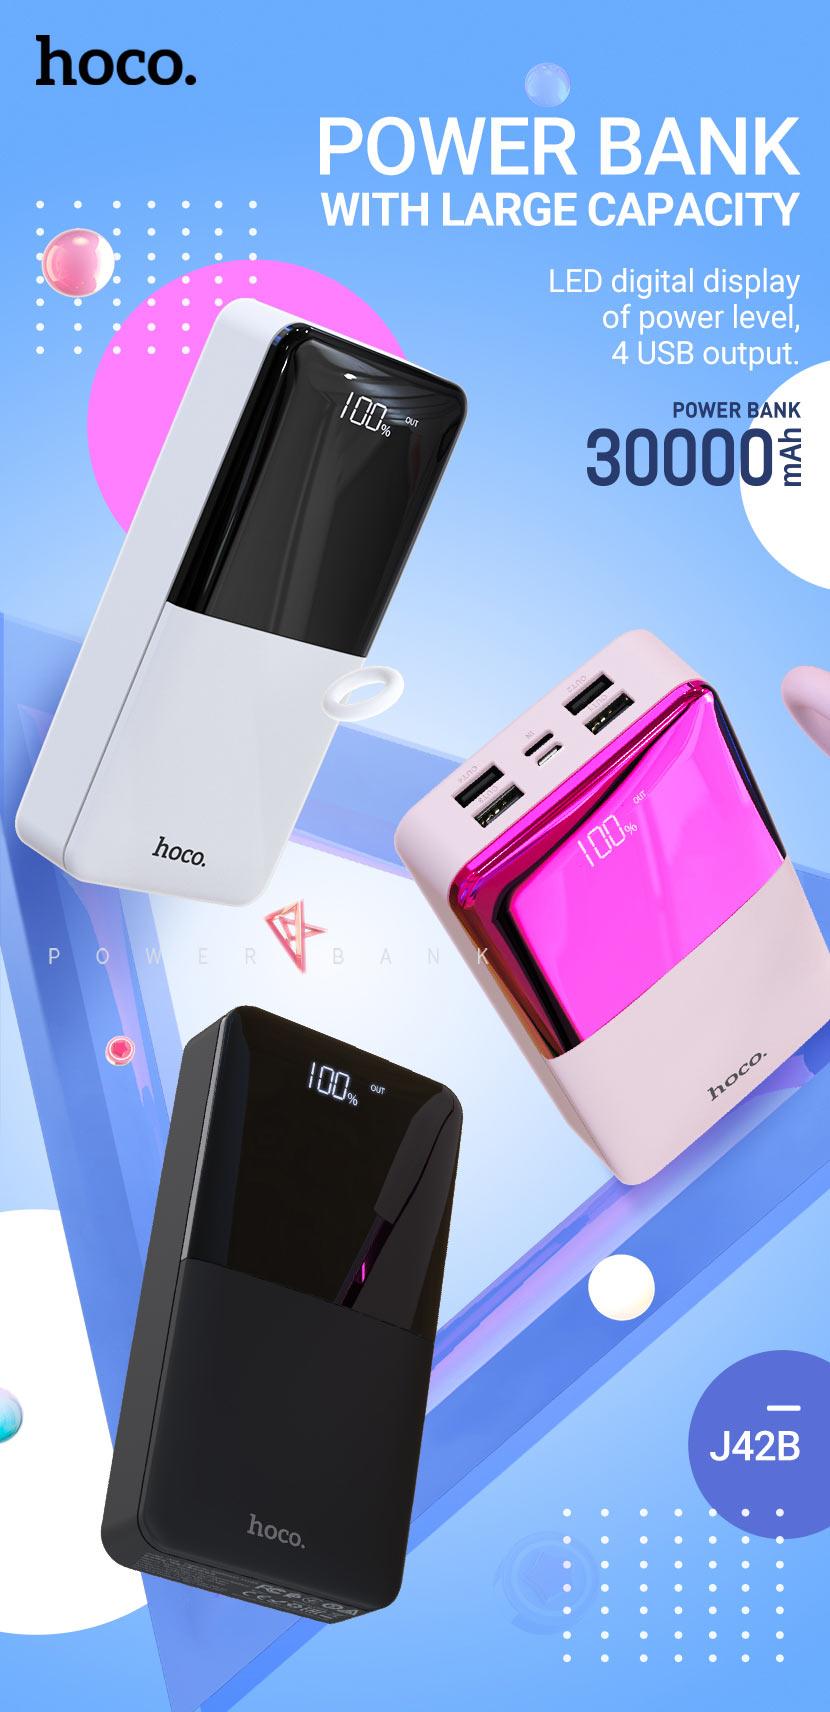 hoco news j42b high power mobile power bank 30000mah en